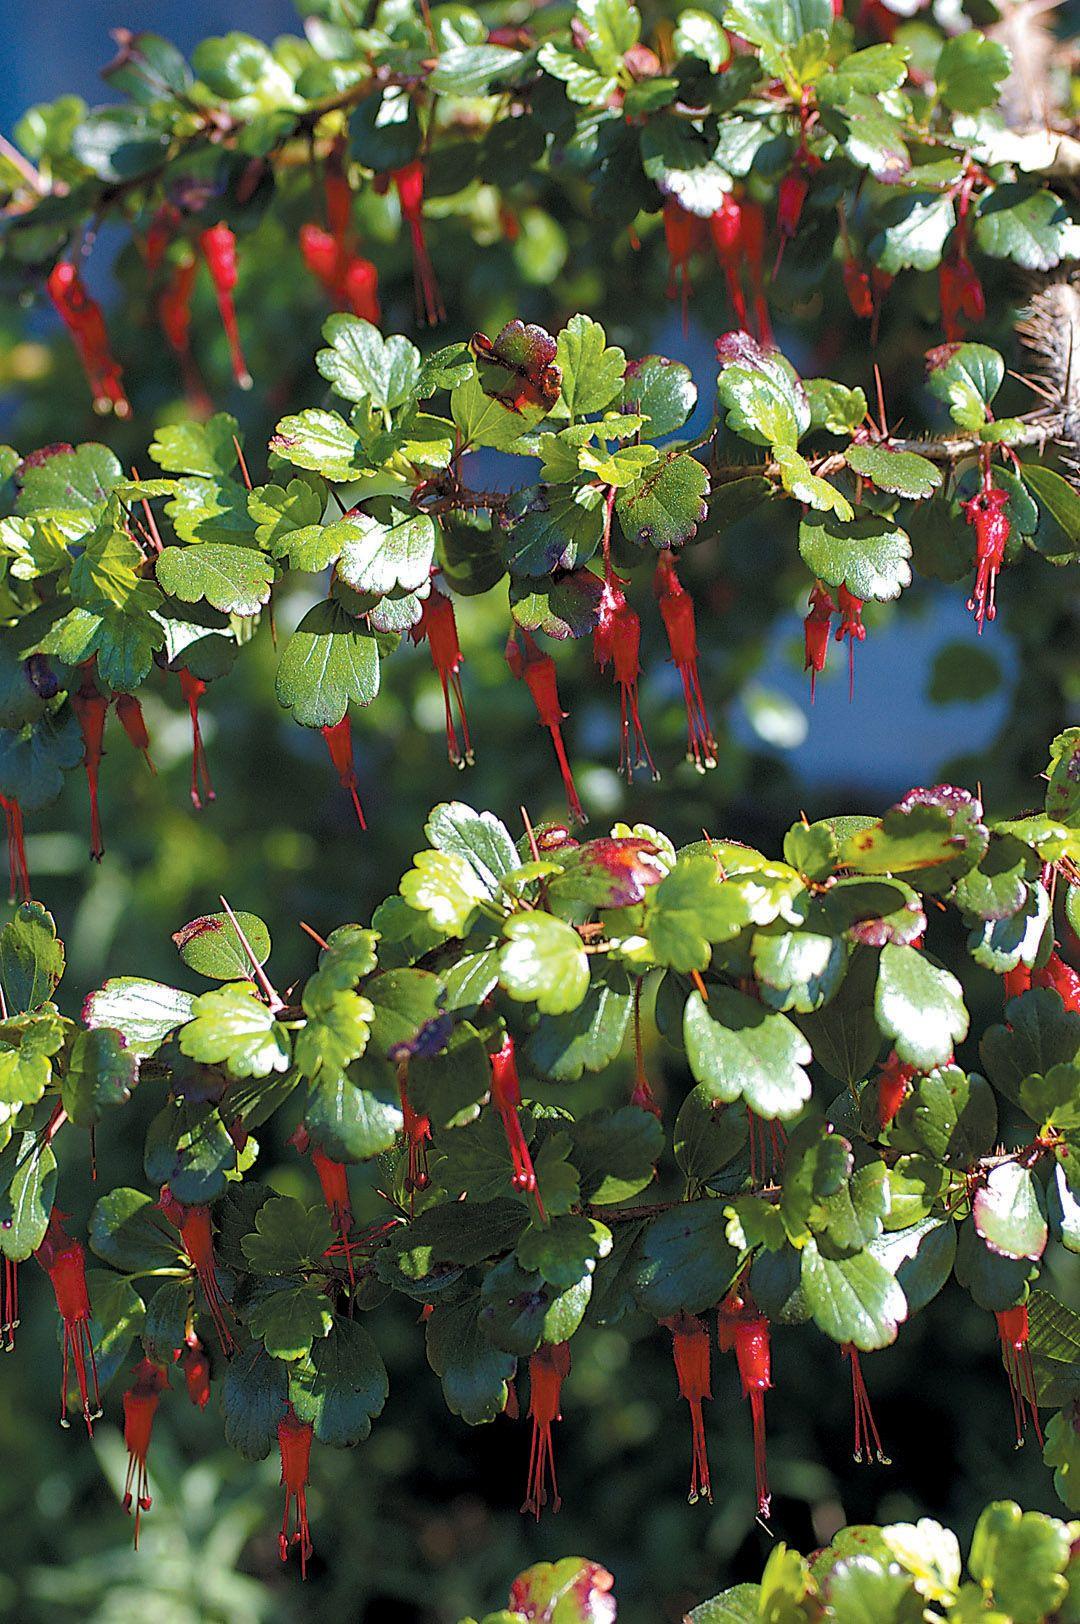 Secrets of gardening: planting gooseberries in autumn